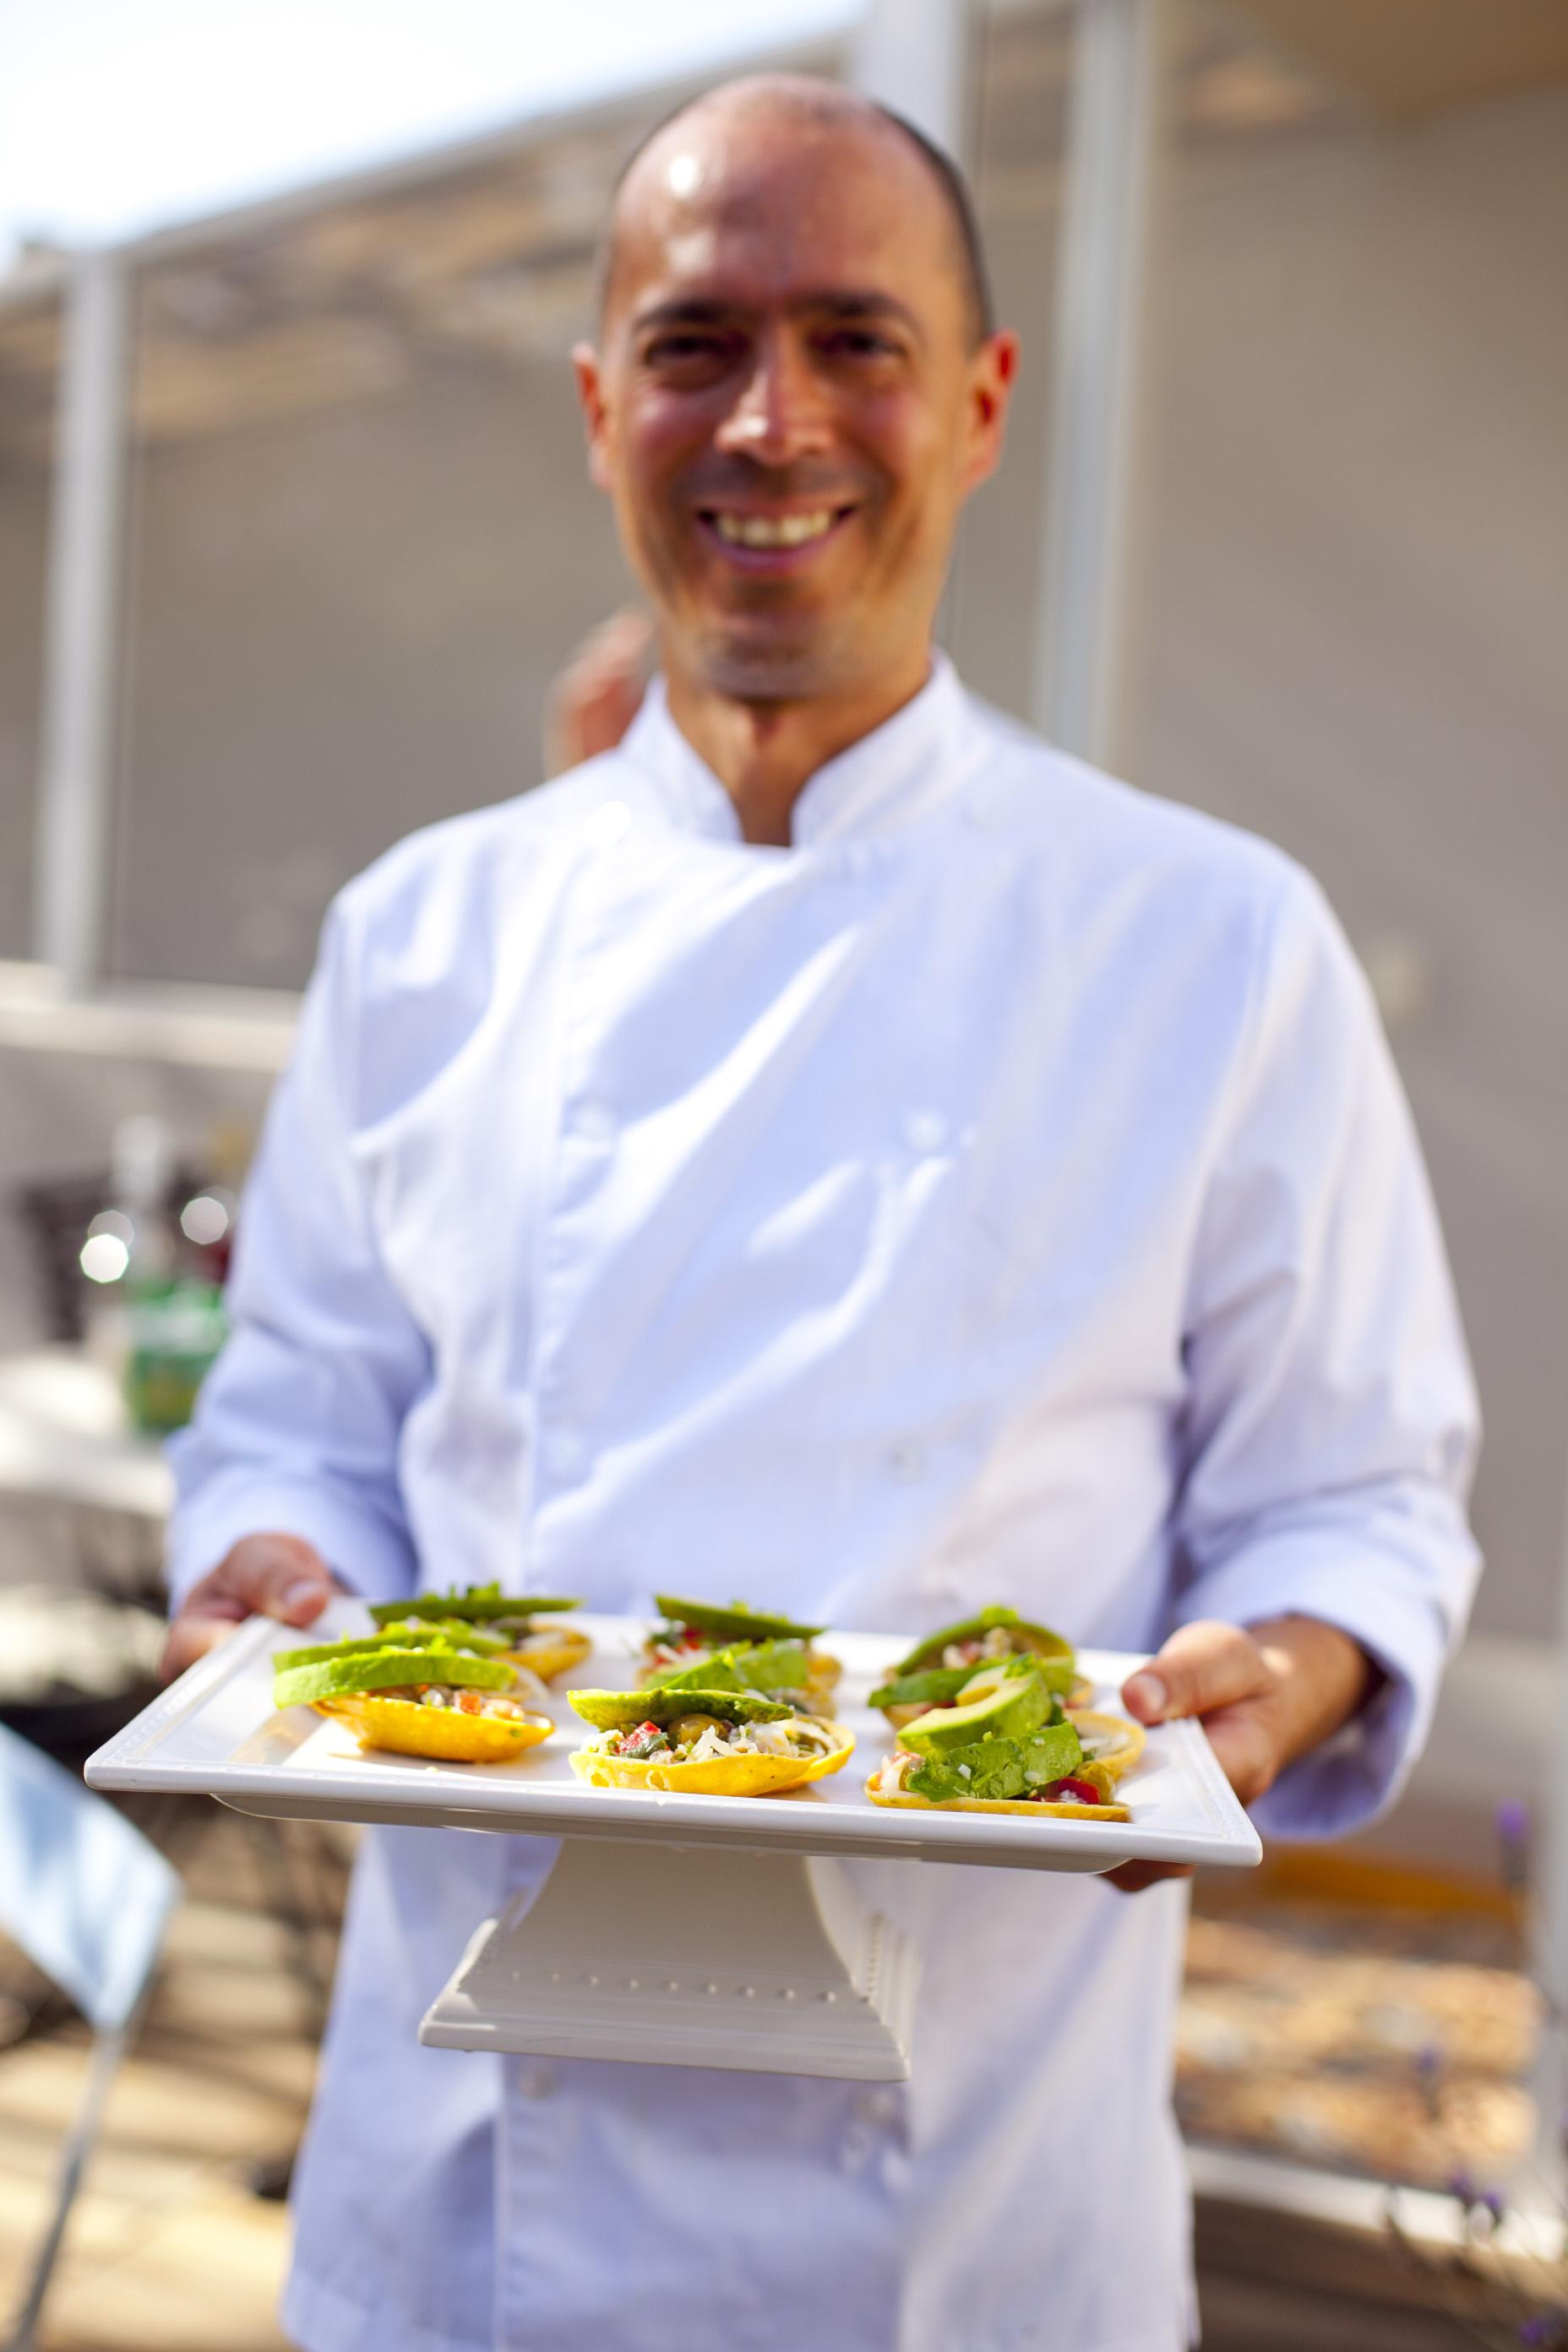 Copy of man serving Ceviche Tostadas